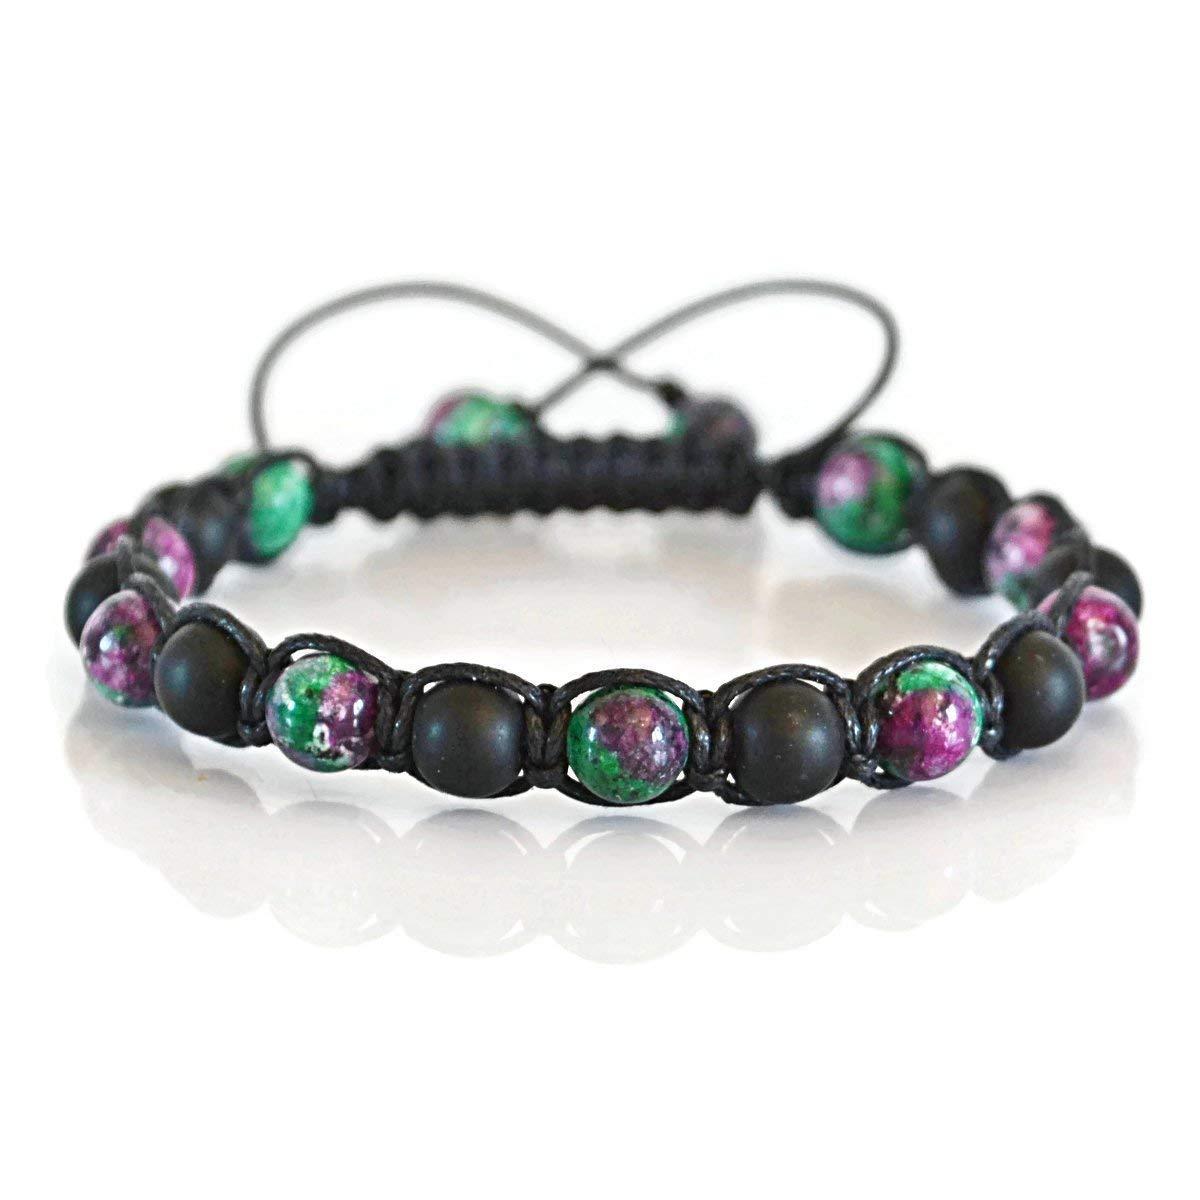 Green Onyx Jewelry Gift For Men And Women Jewelry Making Healing Bracelet Beaded Bracelet Onyx Beads Green Onyx Onyx Bracelet